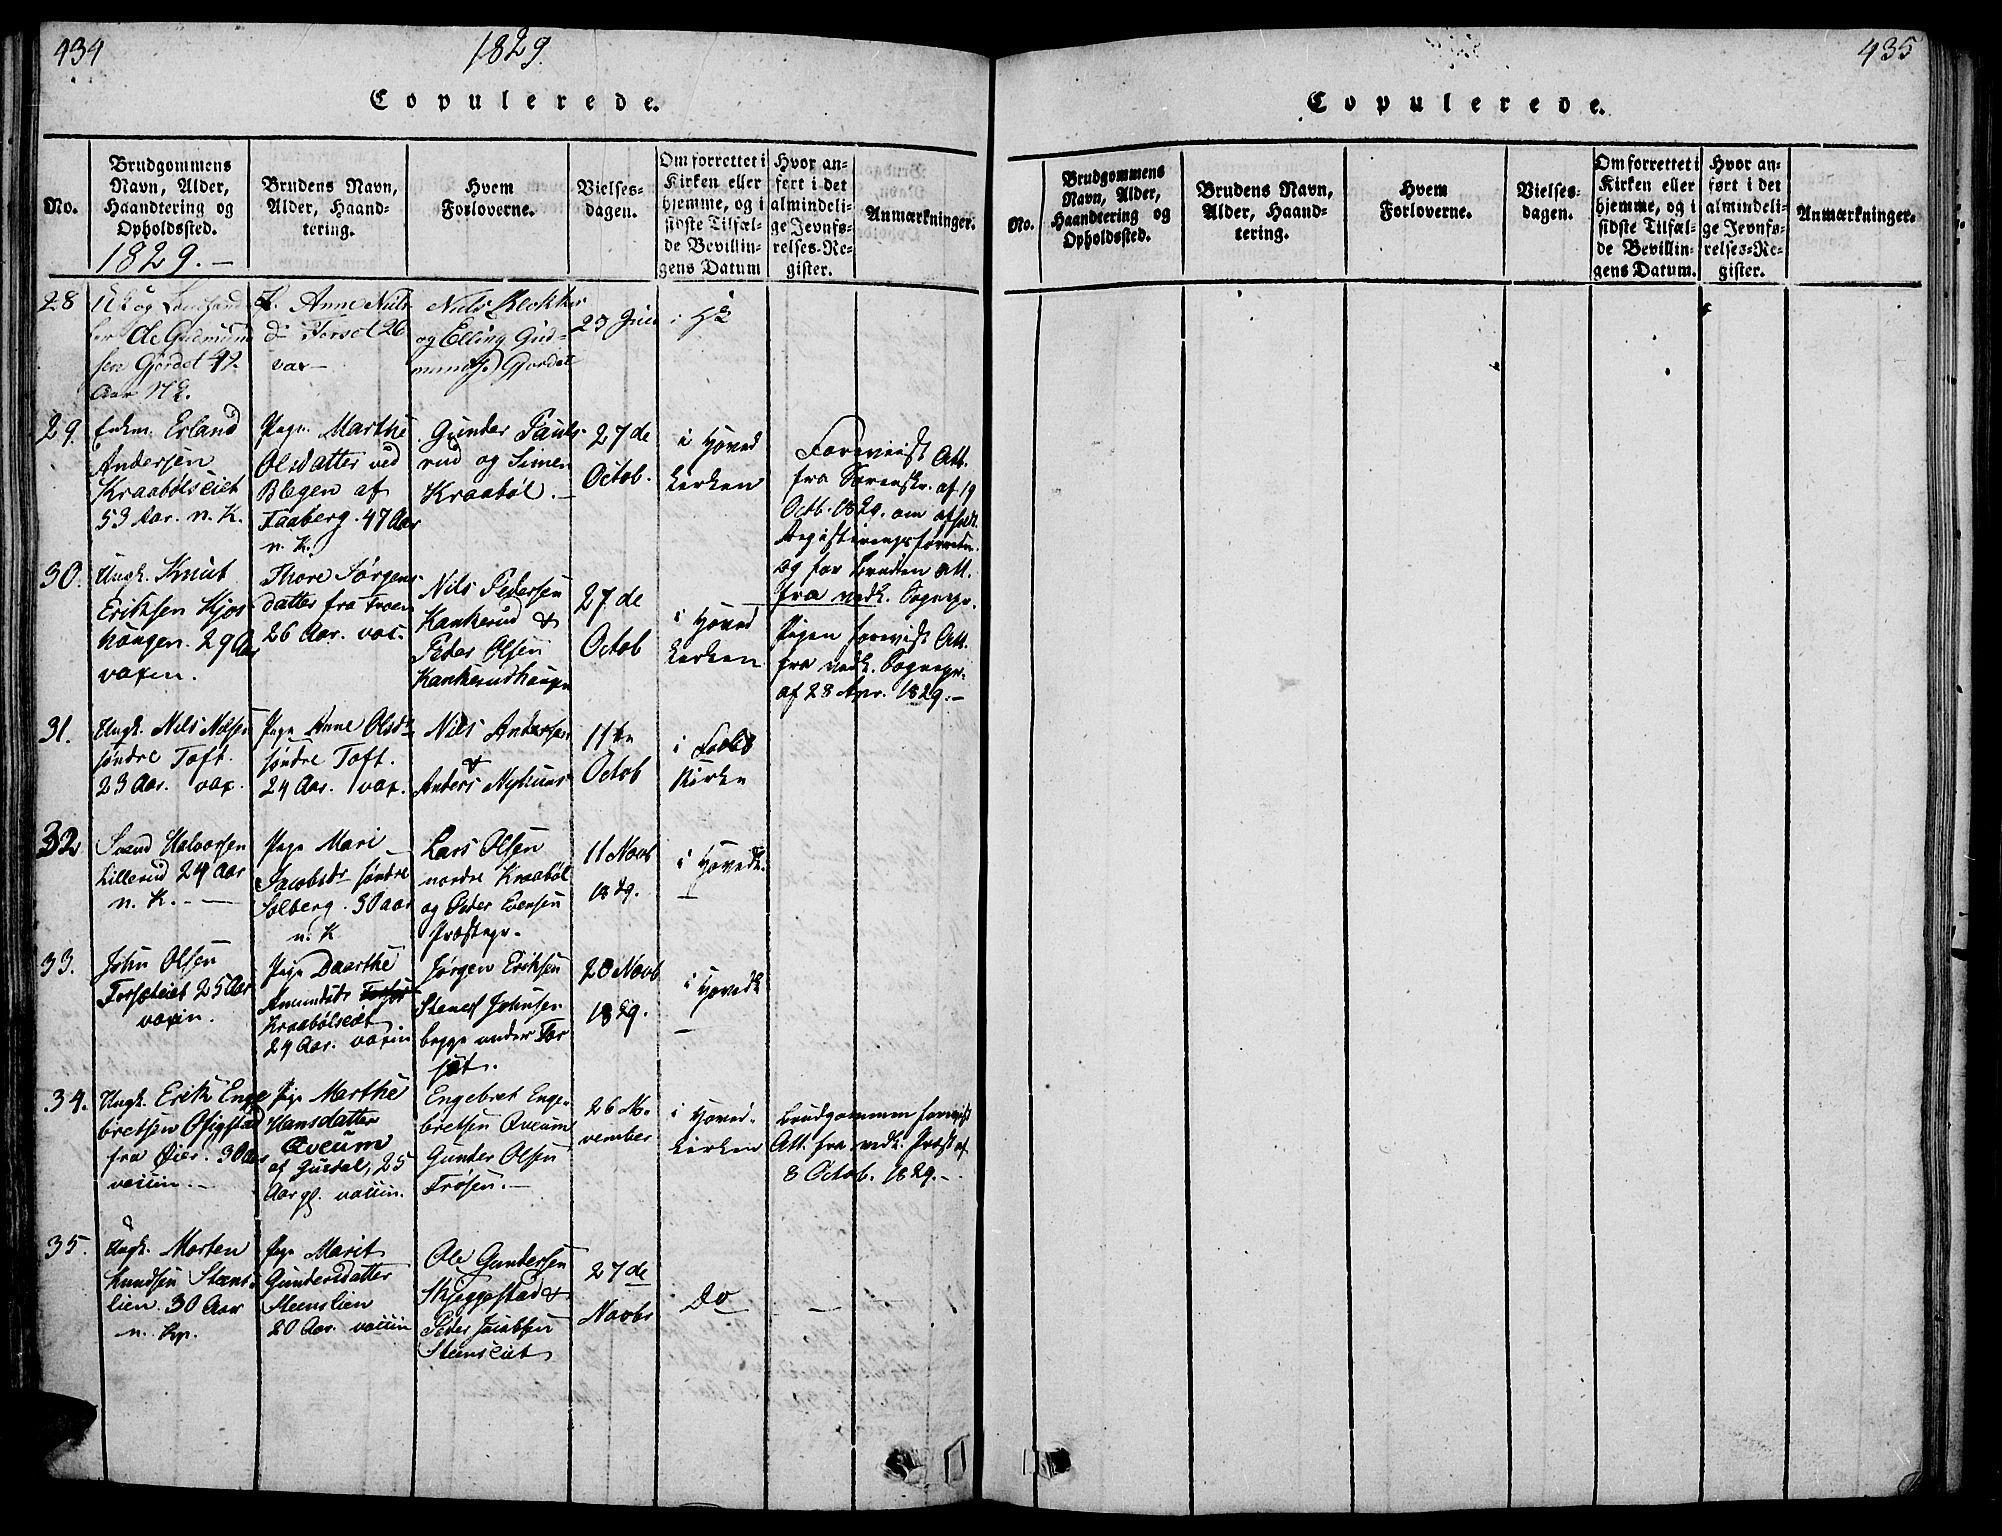 SAH, Gausdal prestekontor, Ministerialbok nr. 5, 1817-1829, s. 434-435